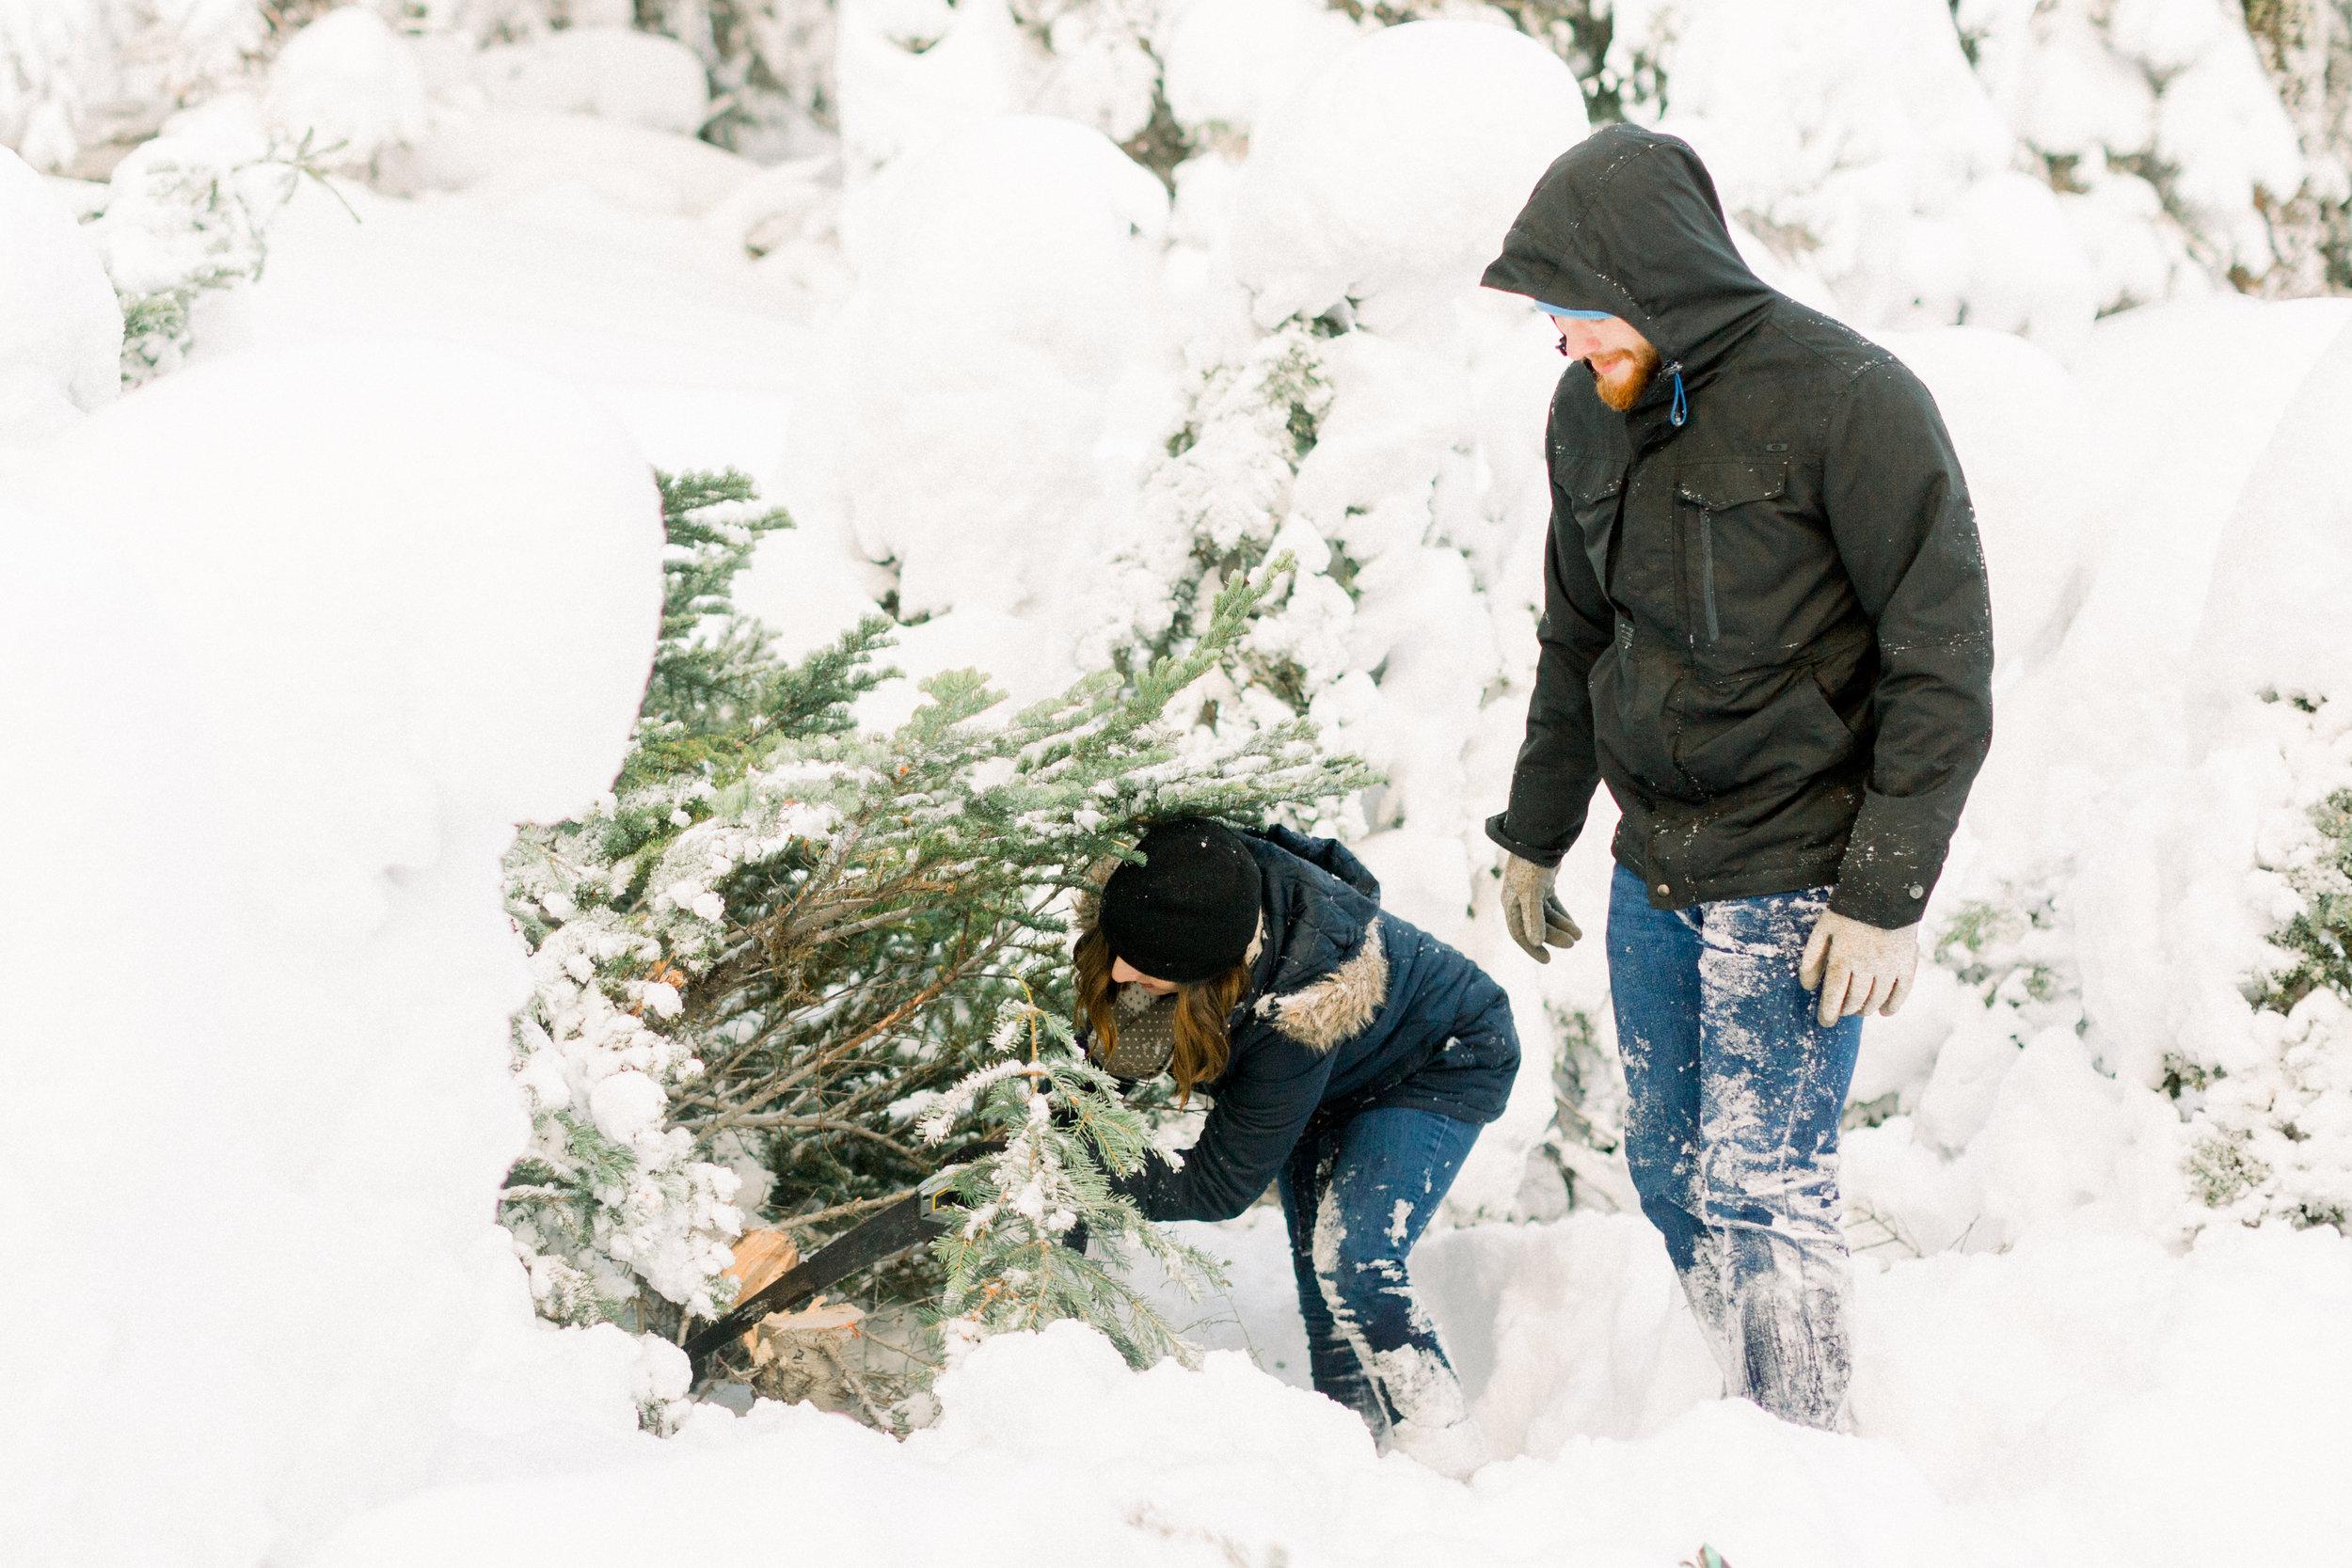 1Butte-Meadows-Christmas-Tree-Adventure (1 of).jpg